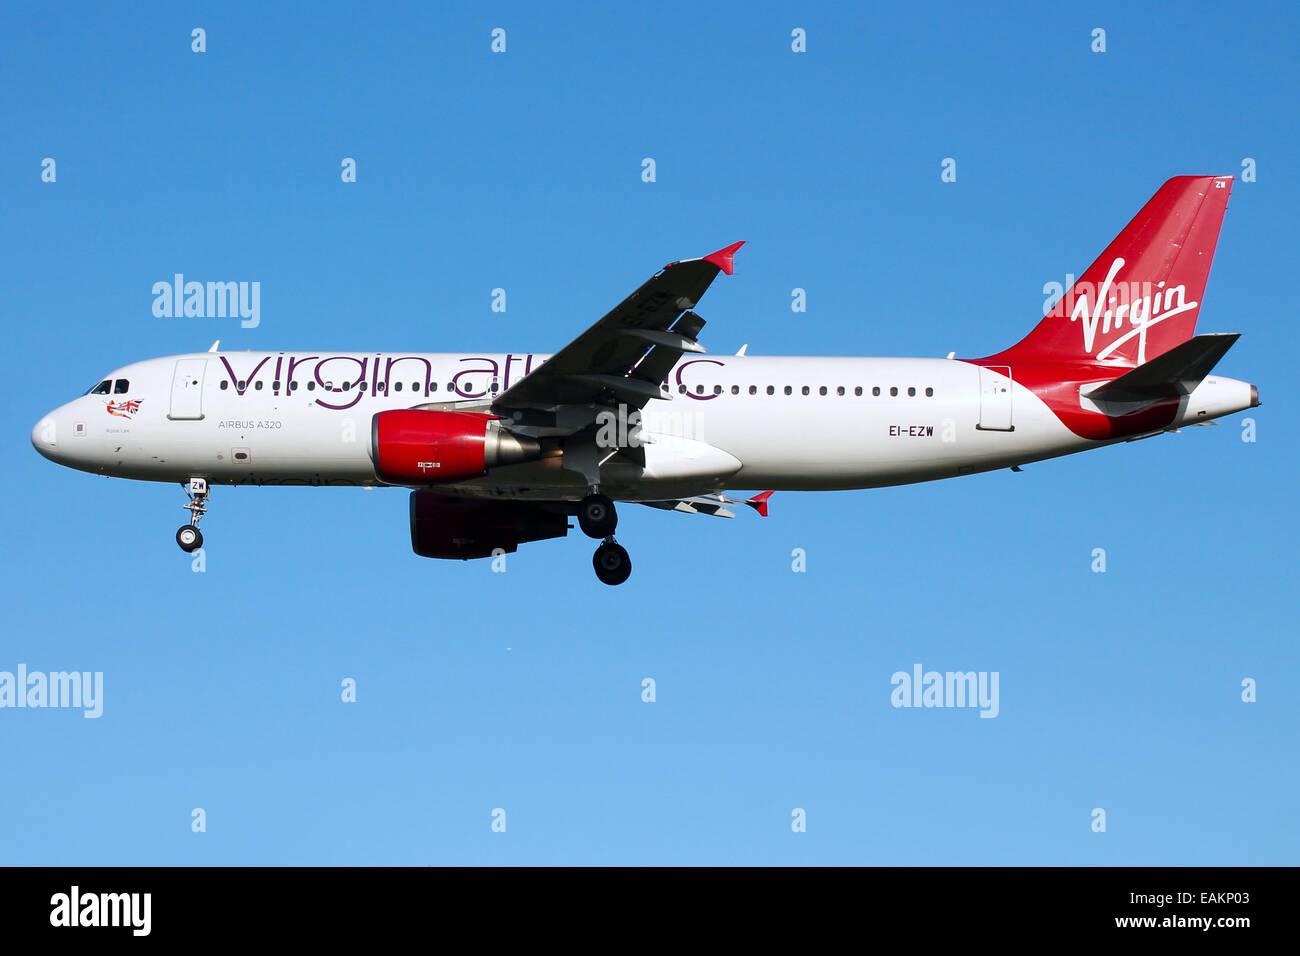 Virgin Atlantic Airbus A320 approaches runway 27L at London